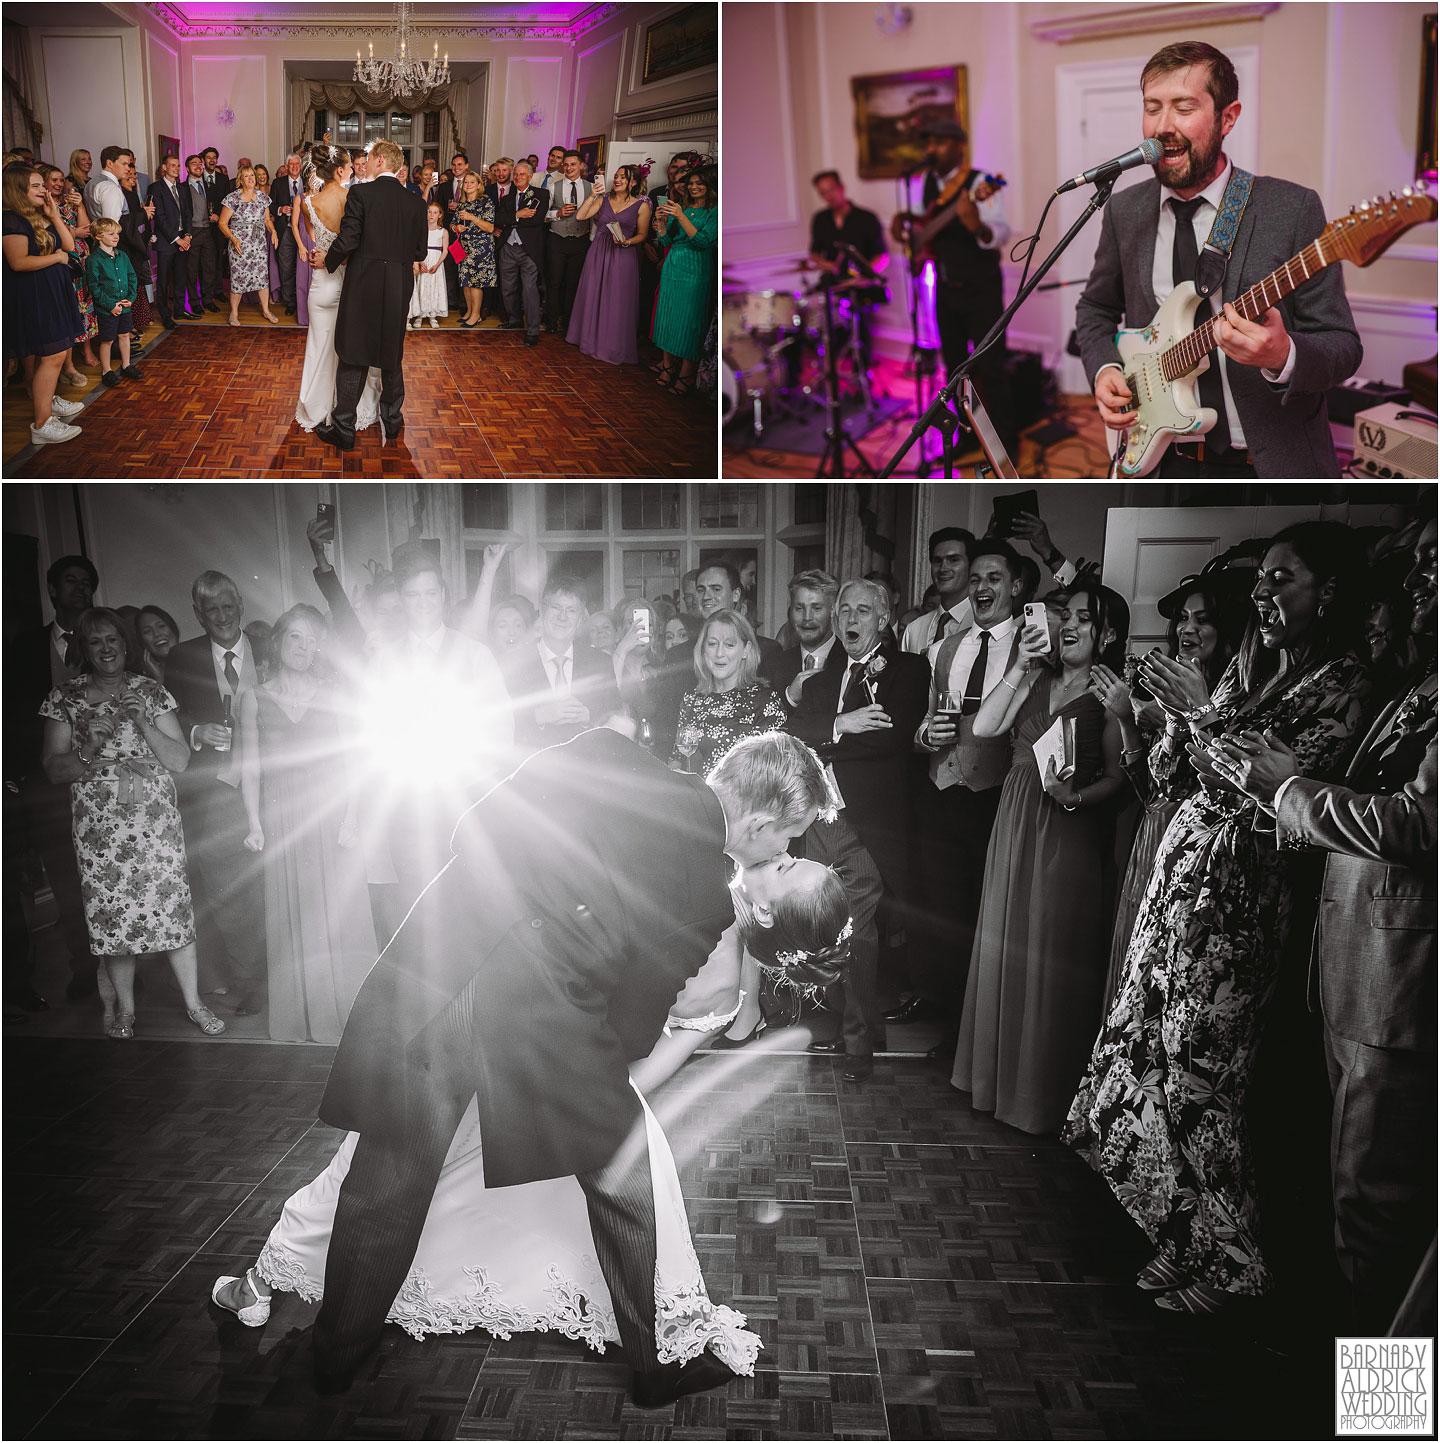 First dance at Goldsborough Hall, Goldsborough Hall Wedding Photography, Yorkshire Wedding, Yorkshire Wedding Photographer, Knaresborough Wedding, Harrogate wedding venue, Yorkshire Stately House Wedding